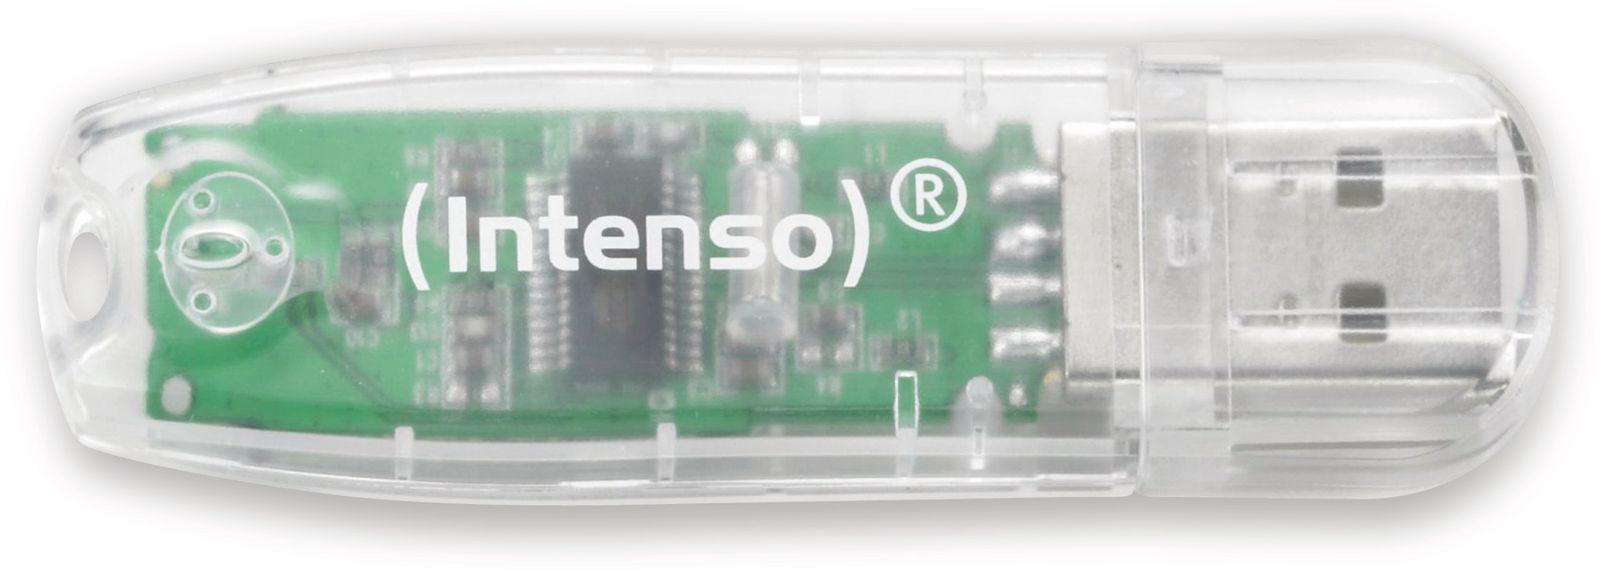 Intenso USB2.0 Stick, 32GB, transparent INTENSO RainbowLine